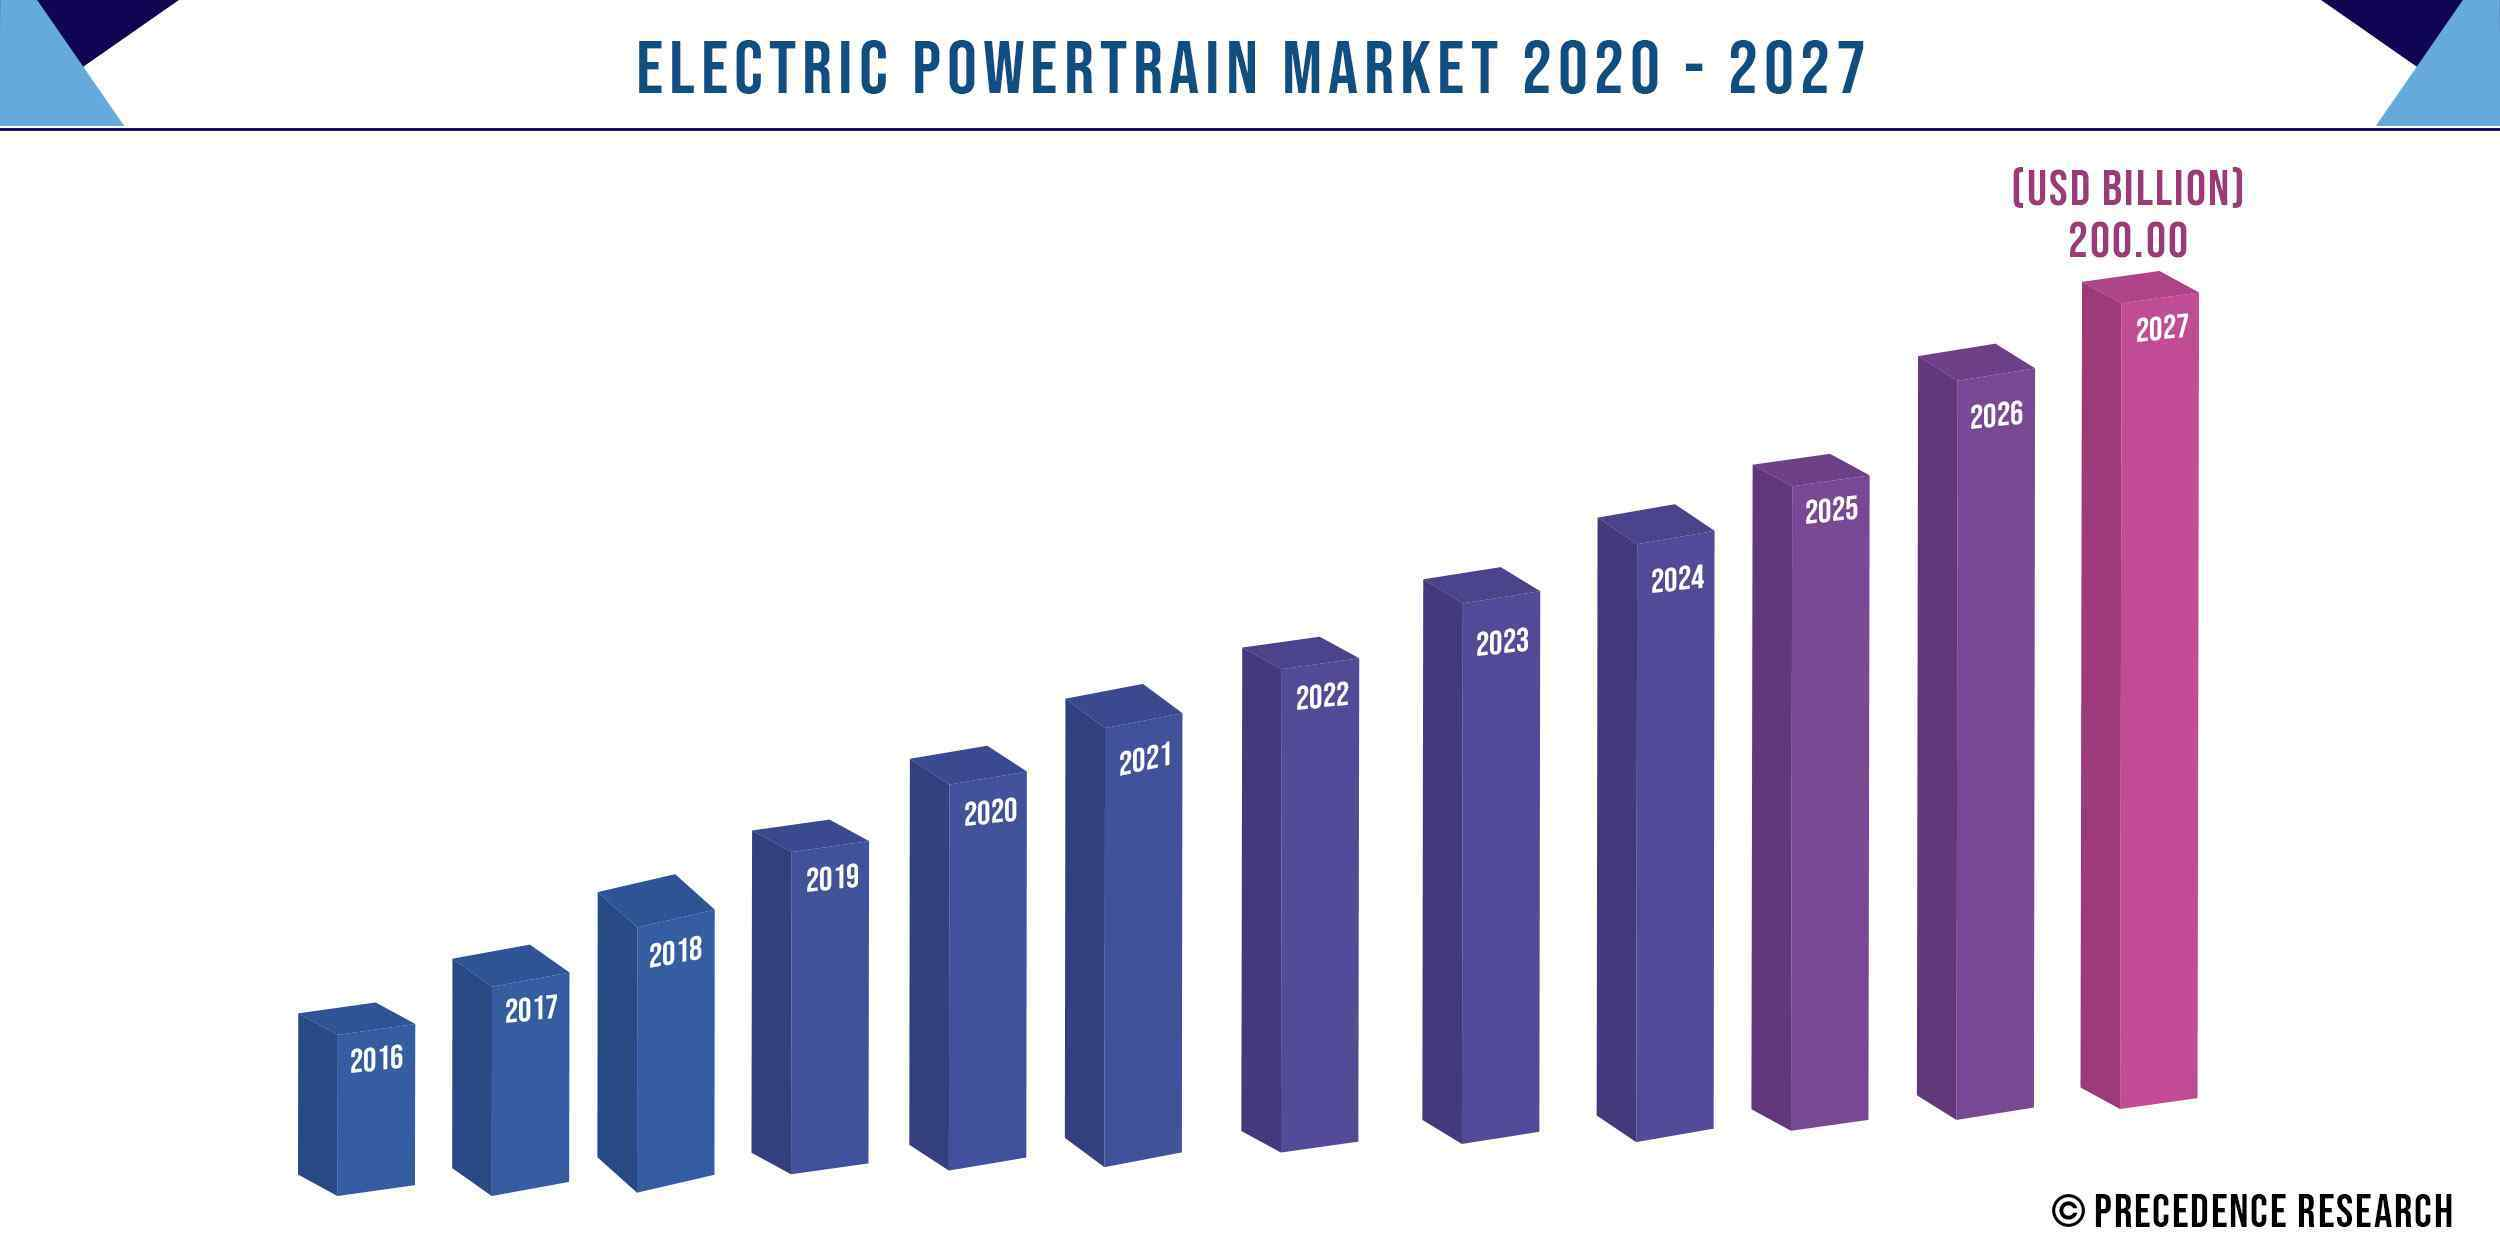 Electric Powertrain Market Size 2016-2027